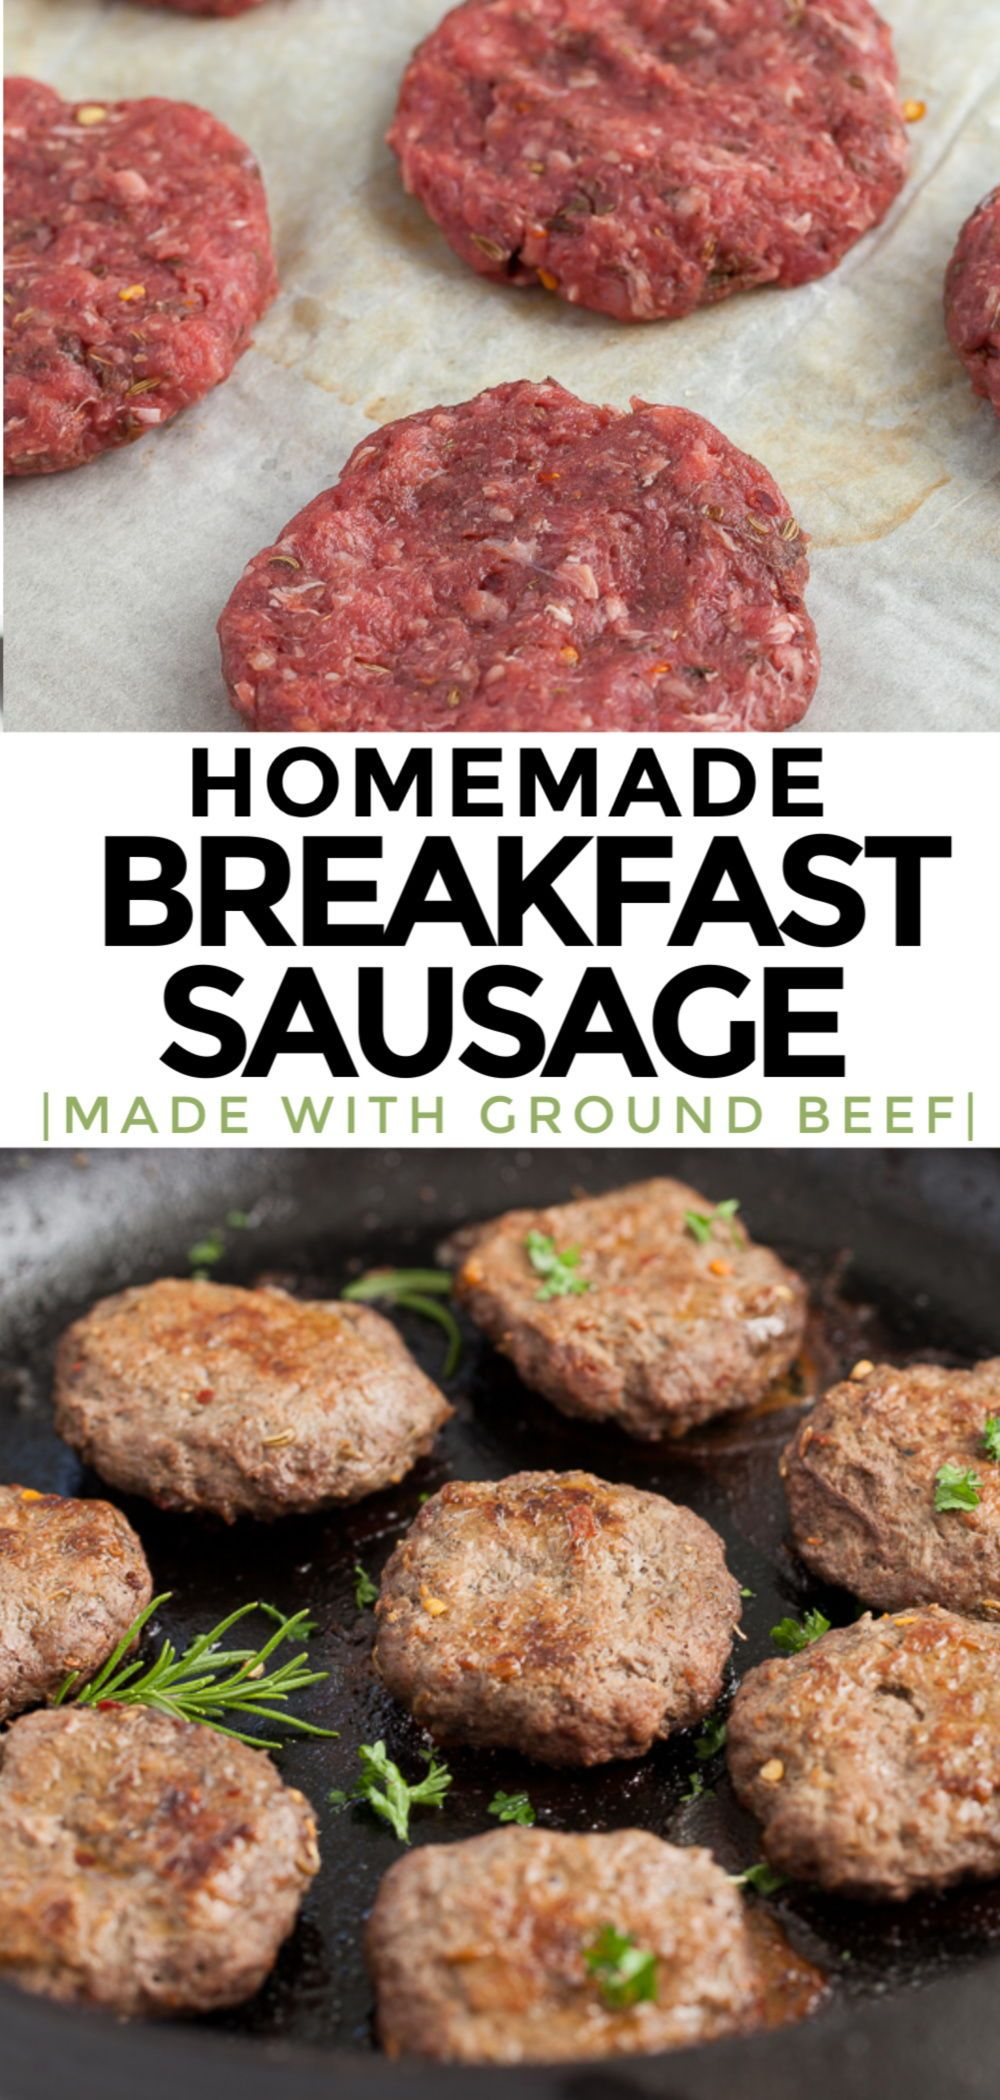 Ground Beef Breakfast Sausage Keto Whole30 Paleo In 2020 Beef Sausage Recipes Ground Beef Breakfast Ground Lamb Recipes